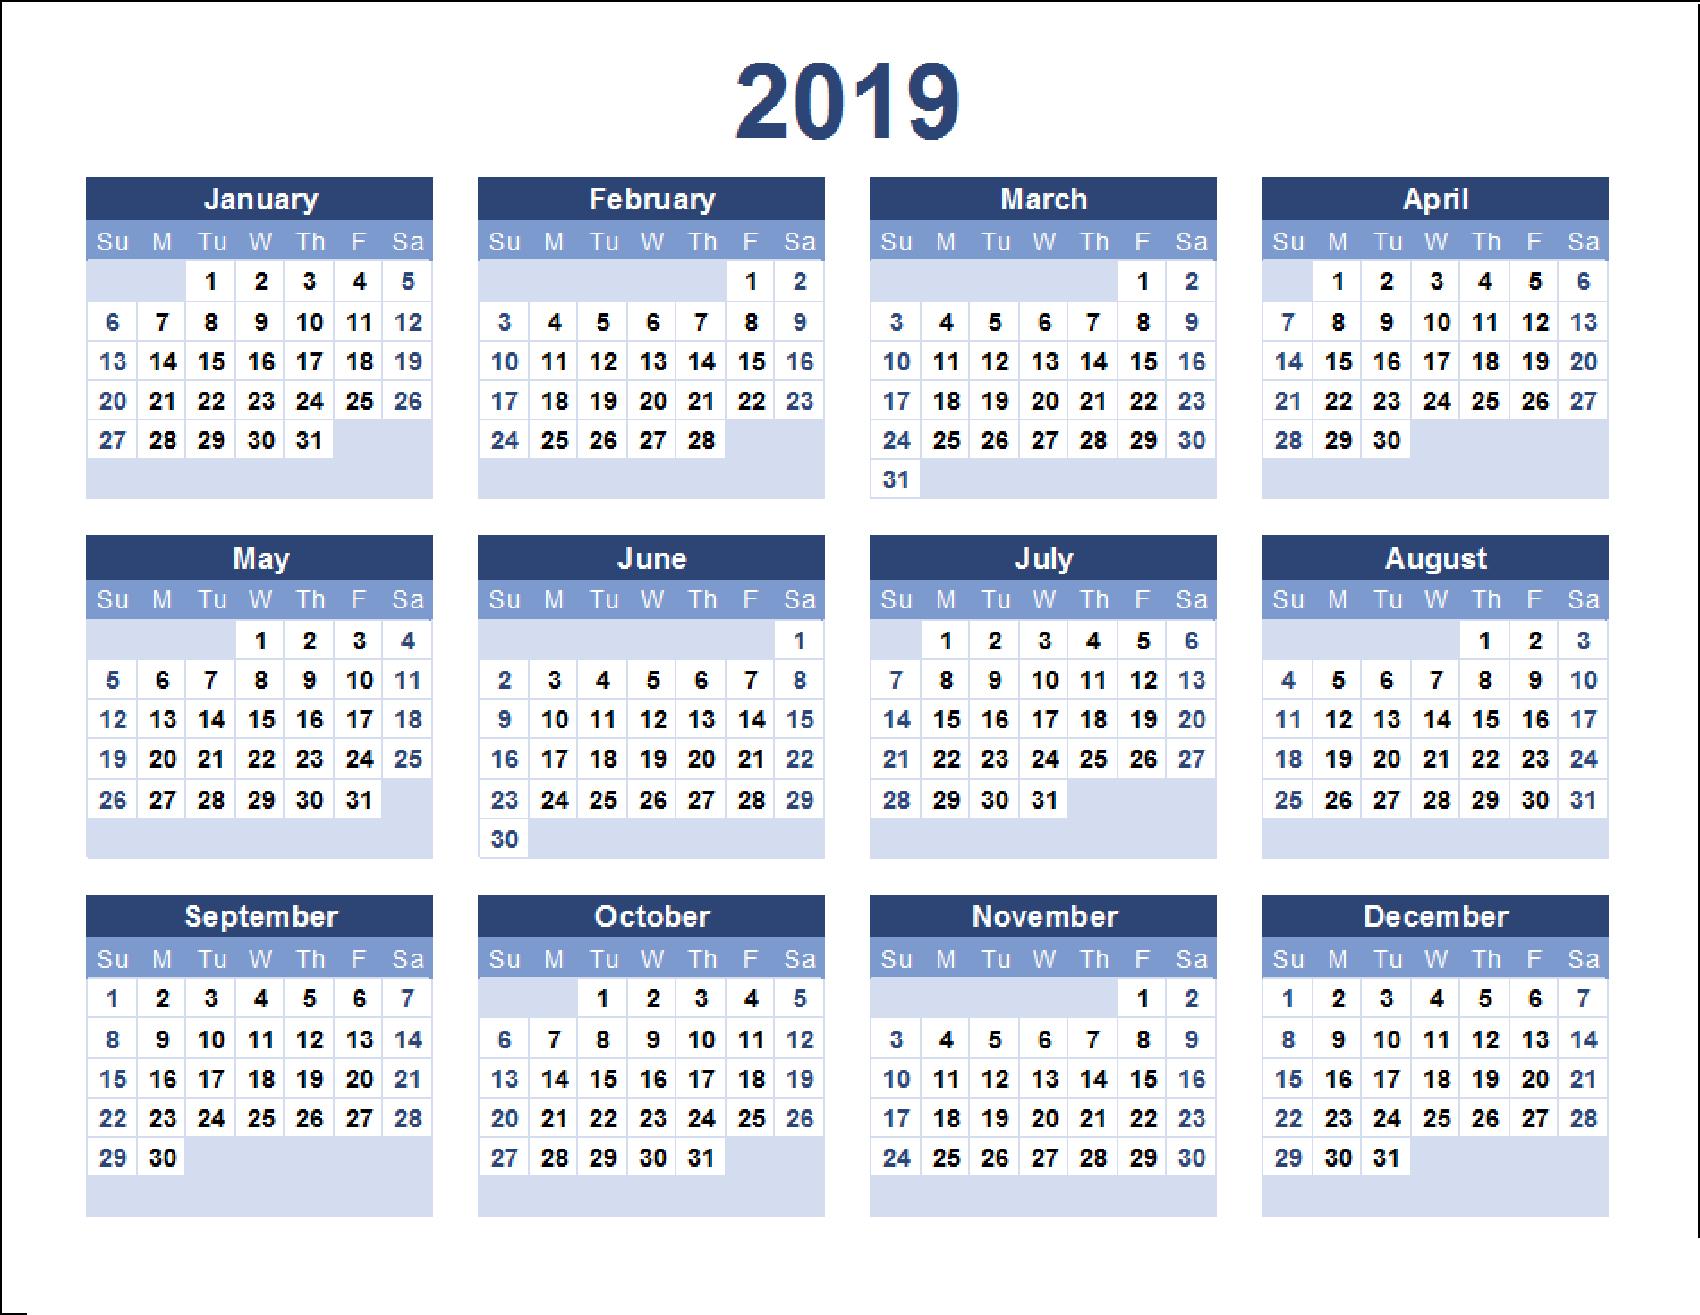 2019 Calendar Excel, Word, Pdf Templates - Printable Monthly Calendar Calendar 2019 Year Excel